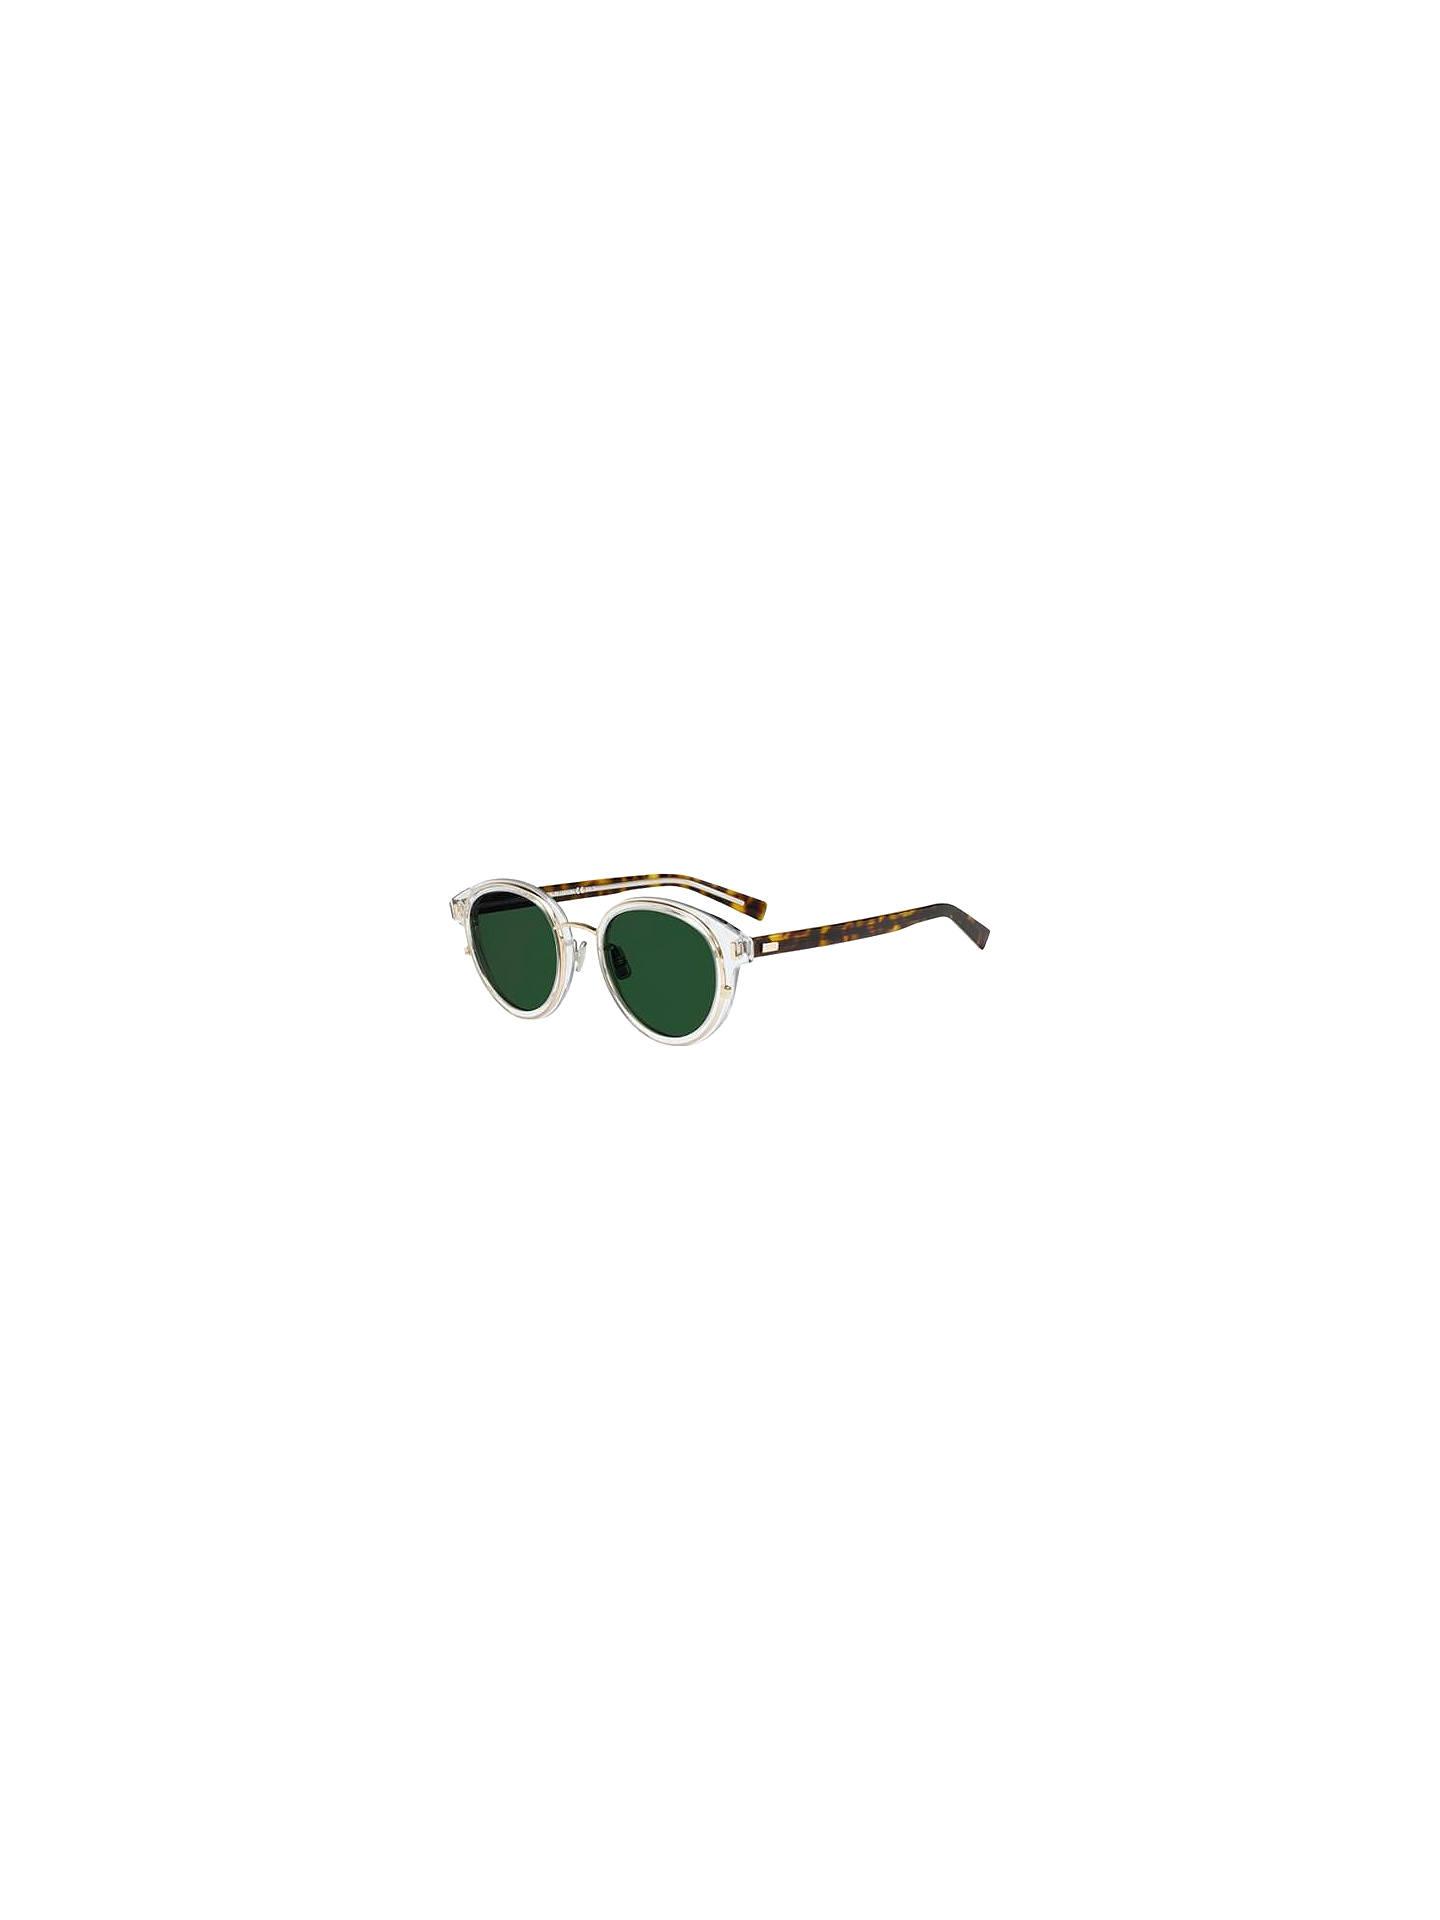 c5519b2183 BuyDior Blacktie2.0S K Oval Sunglasses